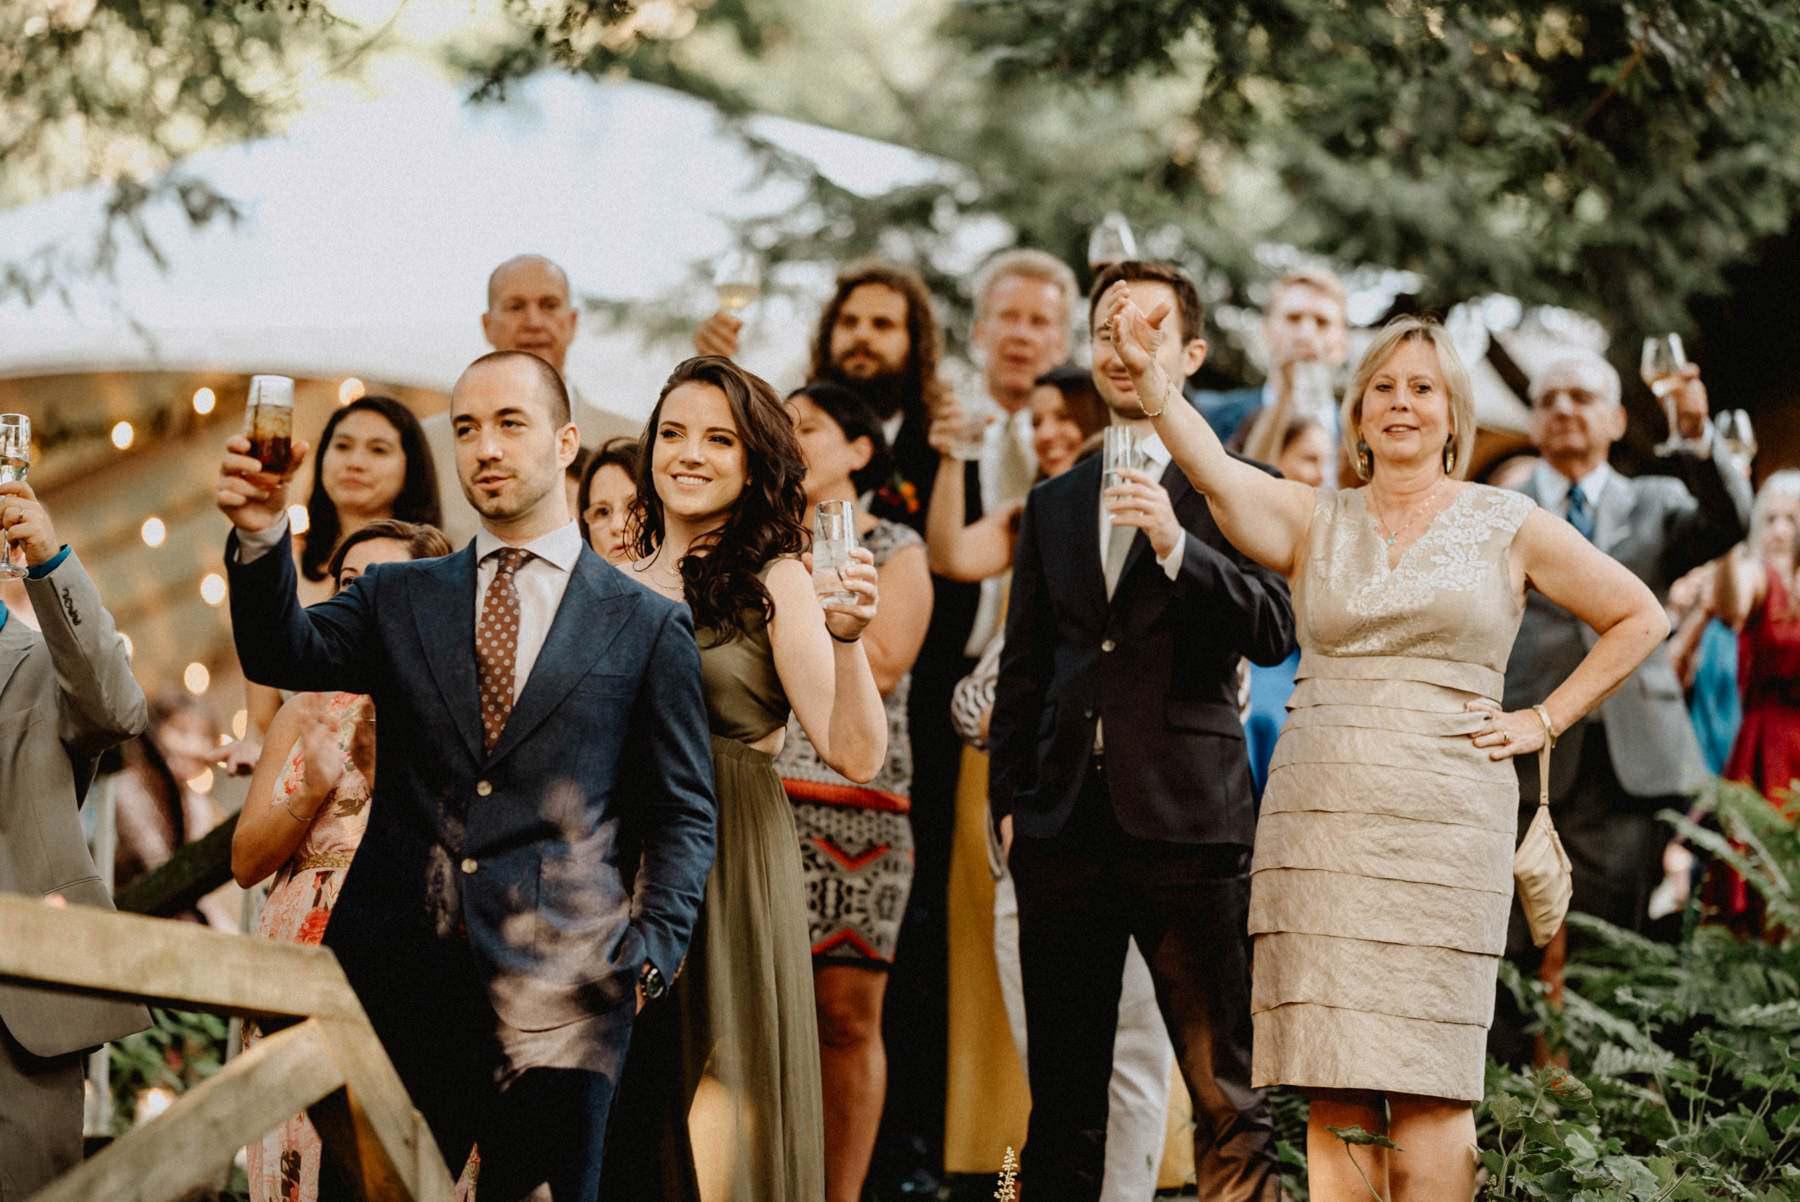 pennsylvania-private-estate-wedding-107.jpg